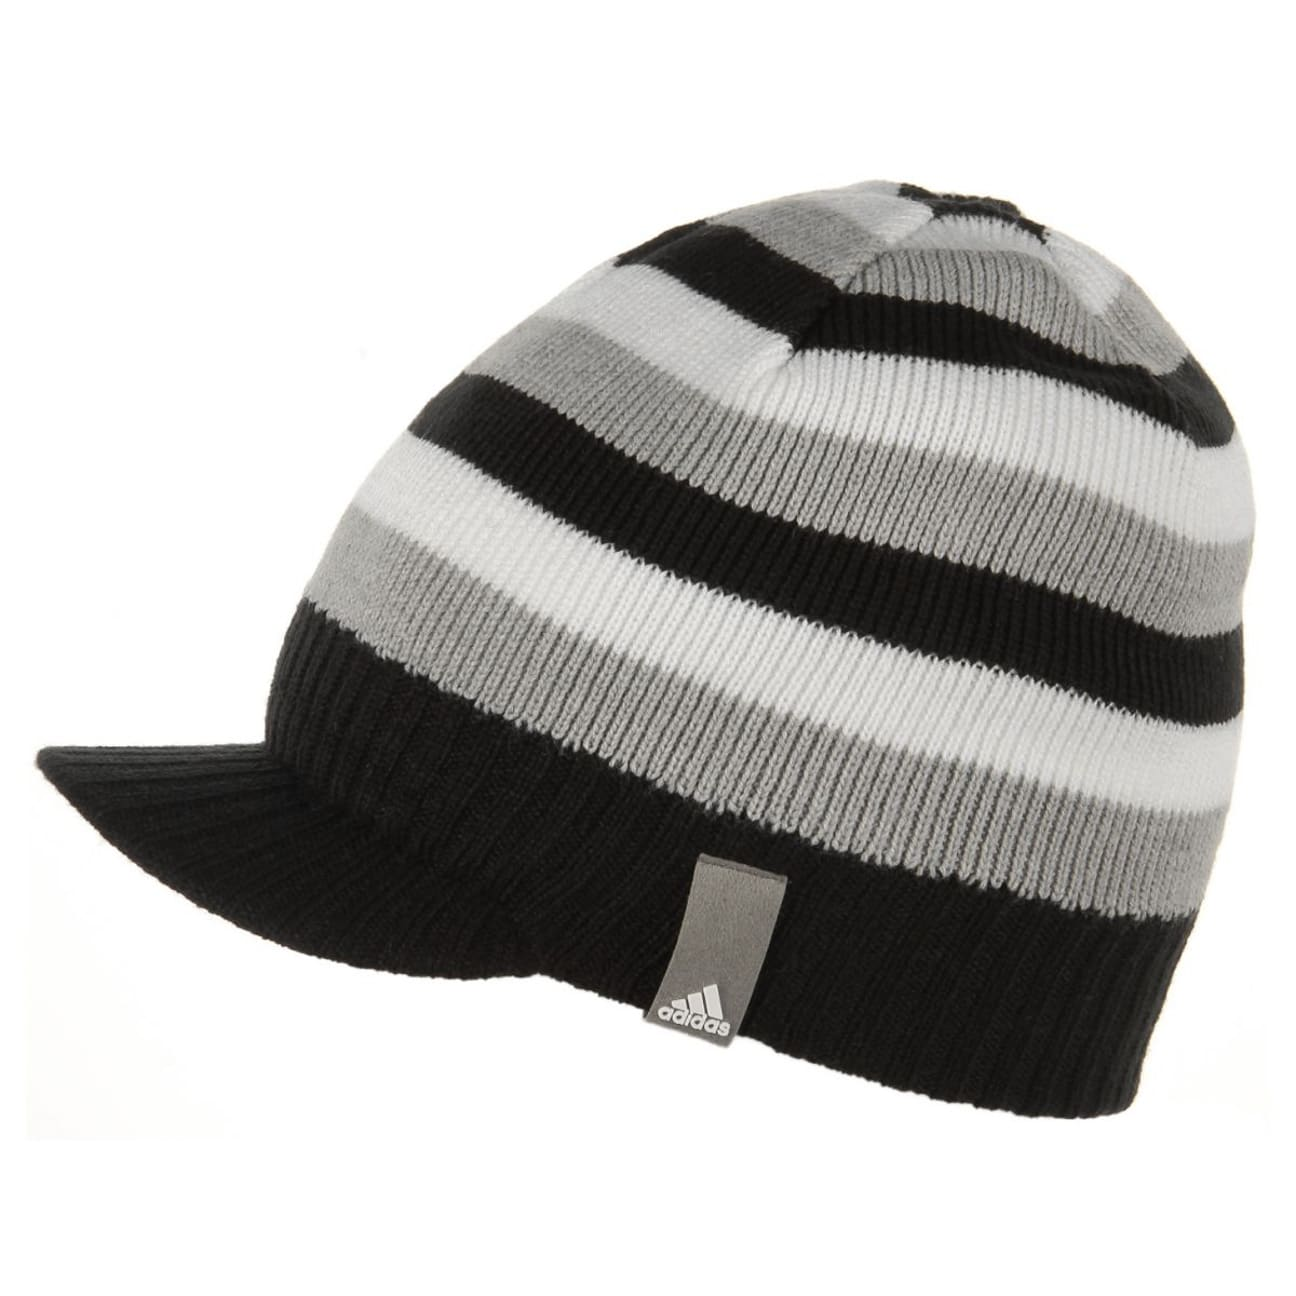 ... KIDS Stripy Visor Beanie by adidas - black 1 a09da138de6